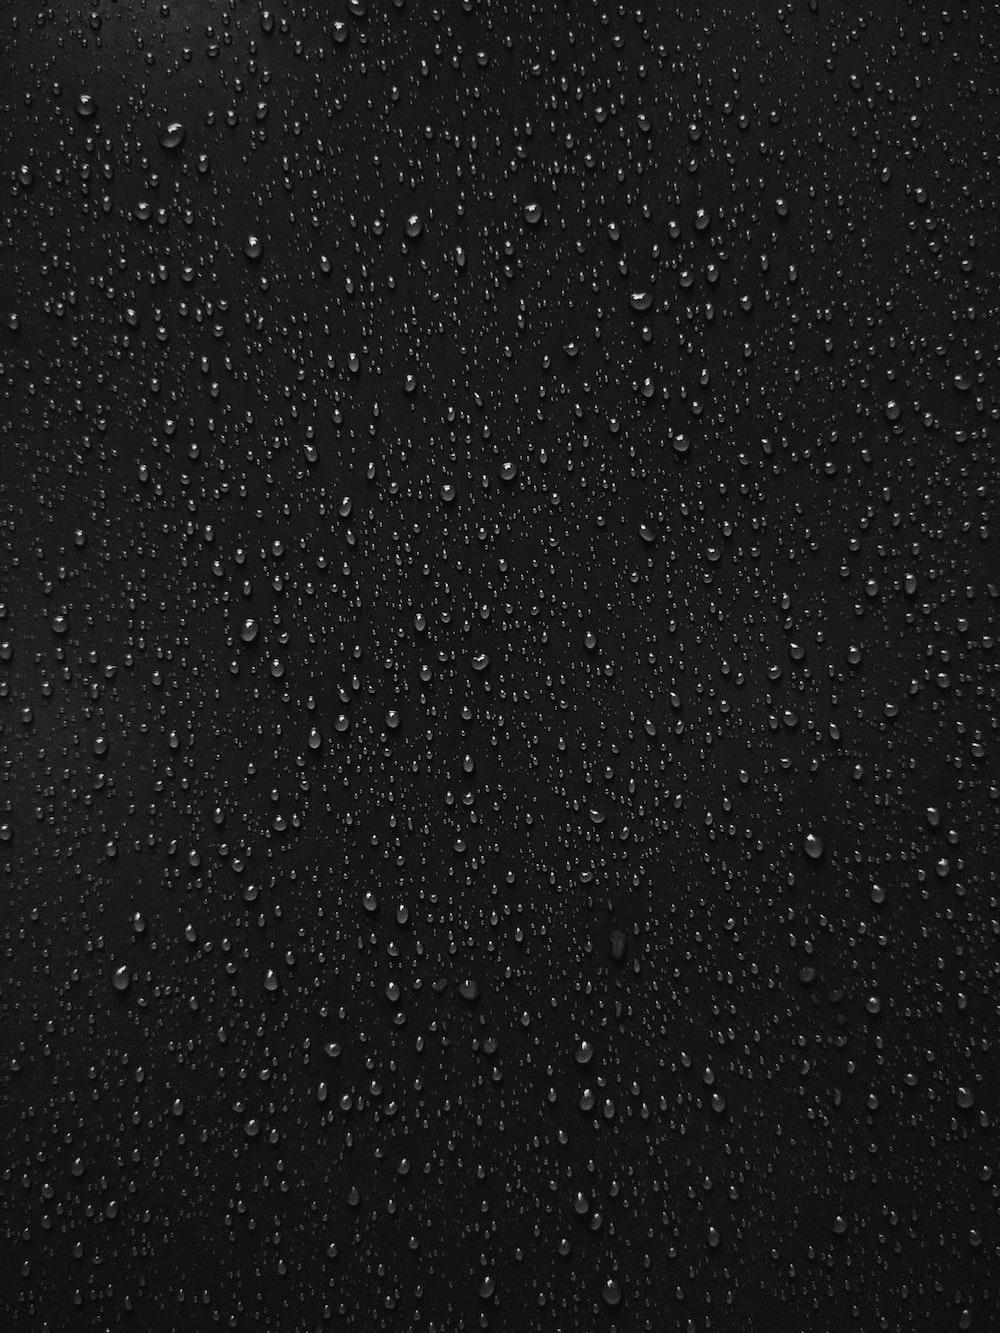 black and white polka dot textile